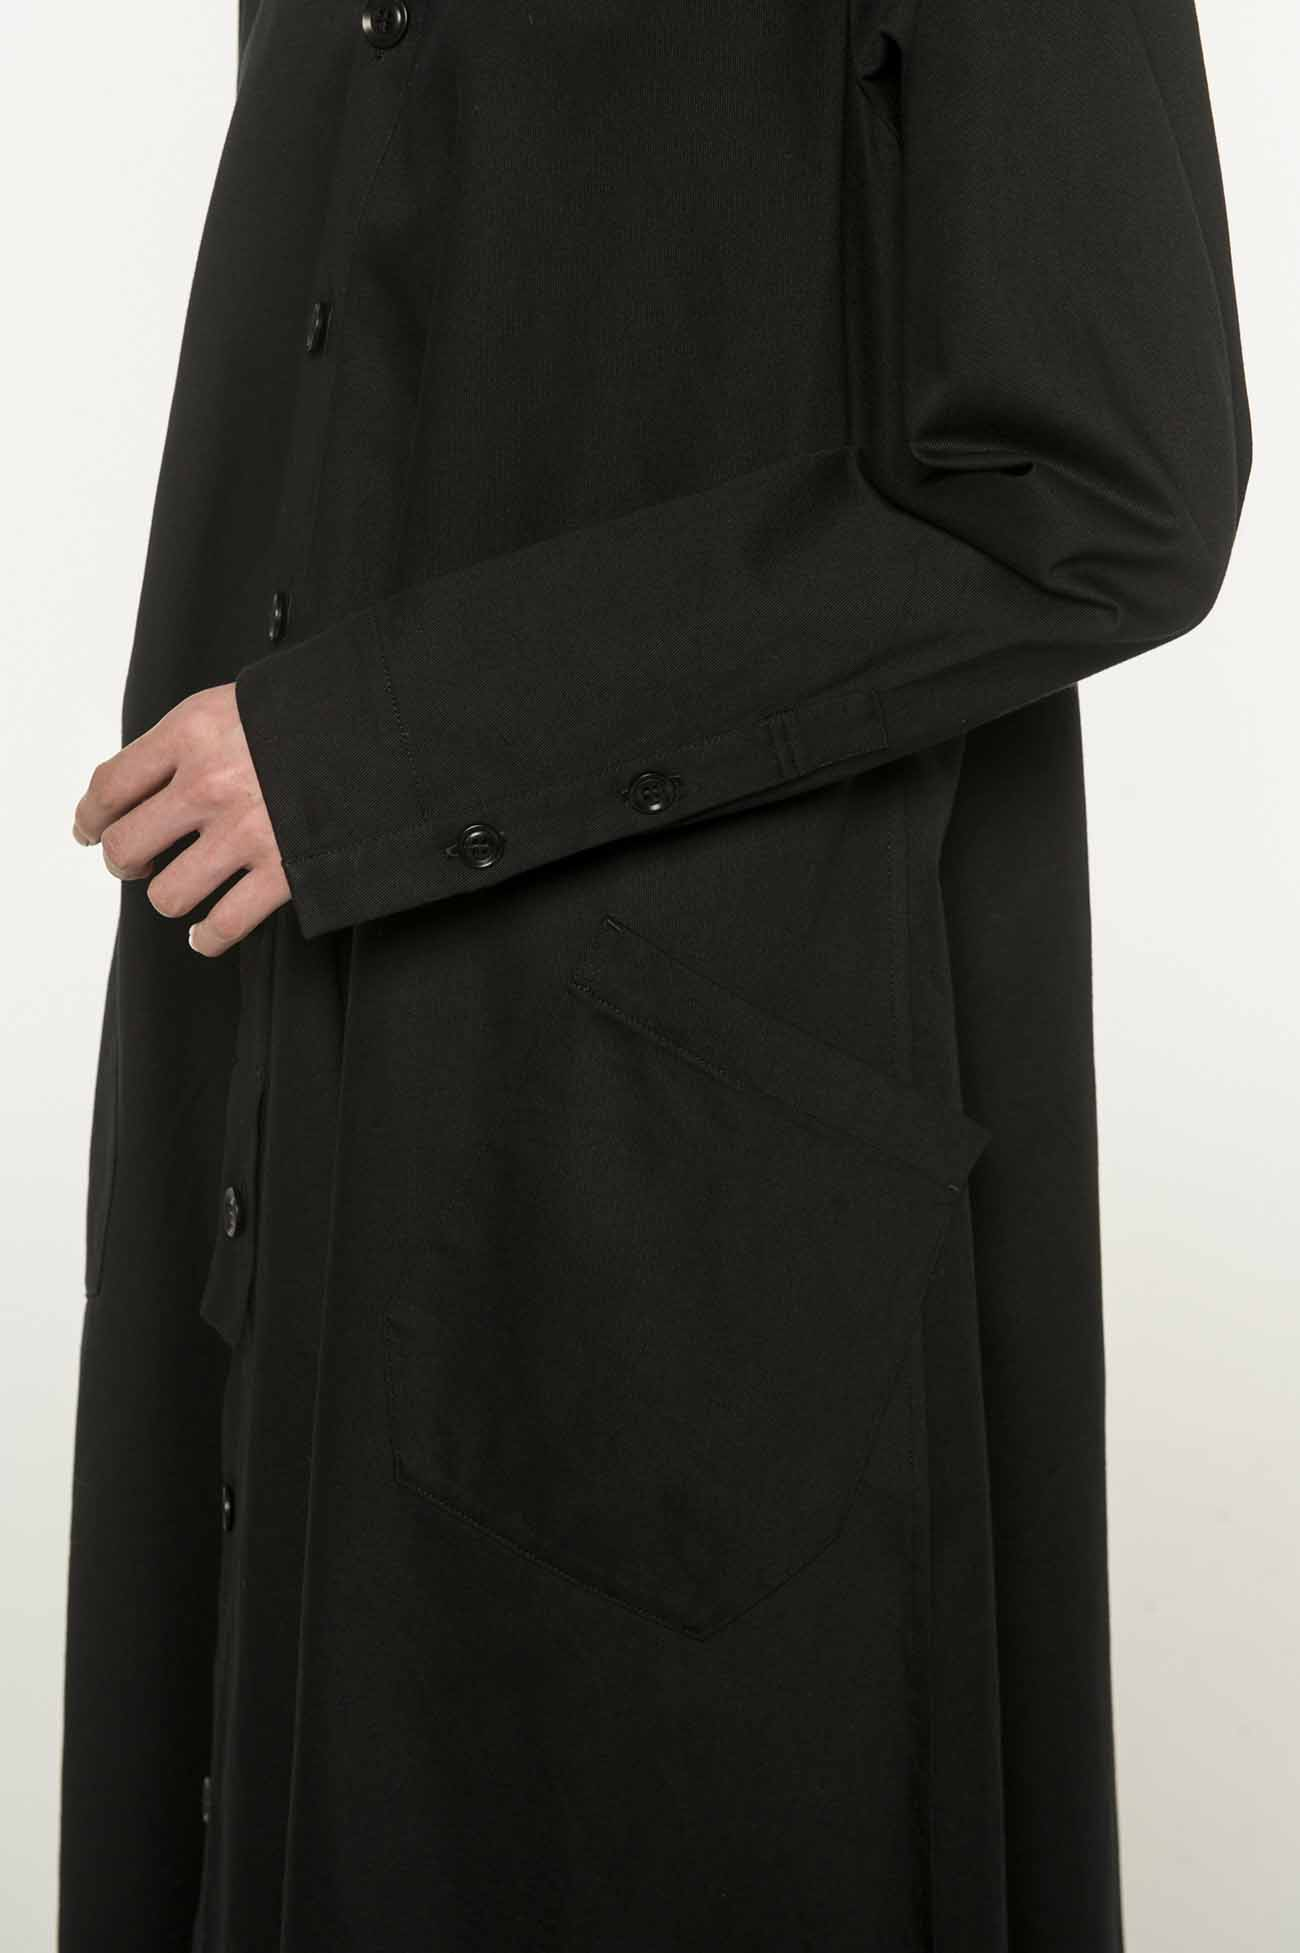 Y's-BORN PRODUCT 斜纹棉质衬衫连衣裙